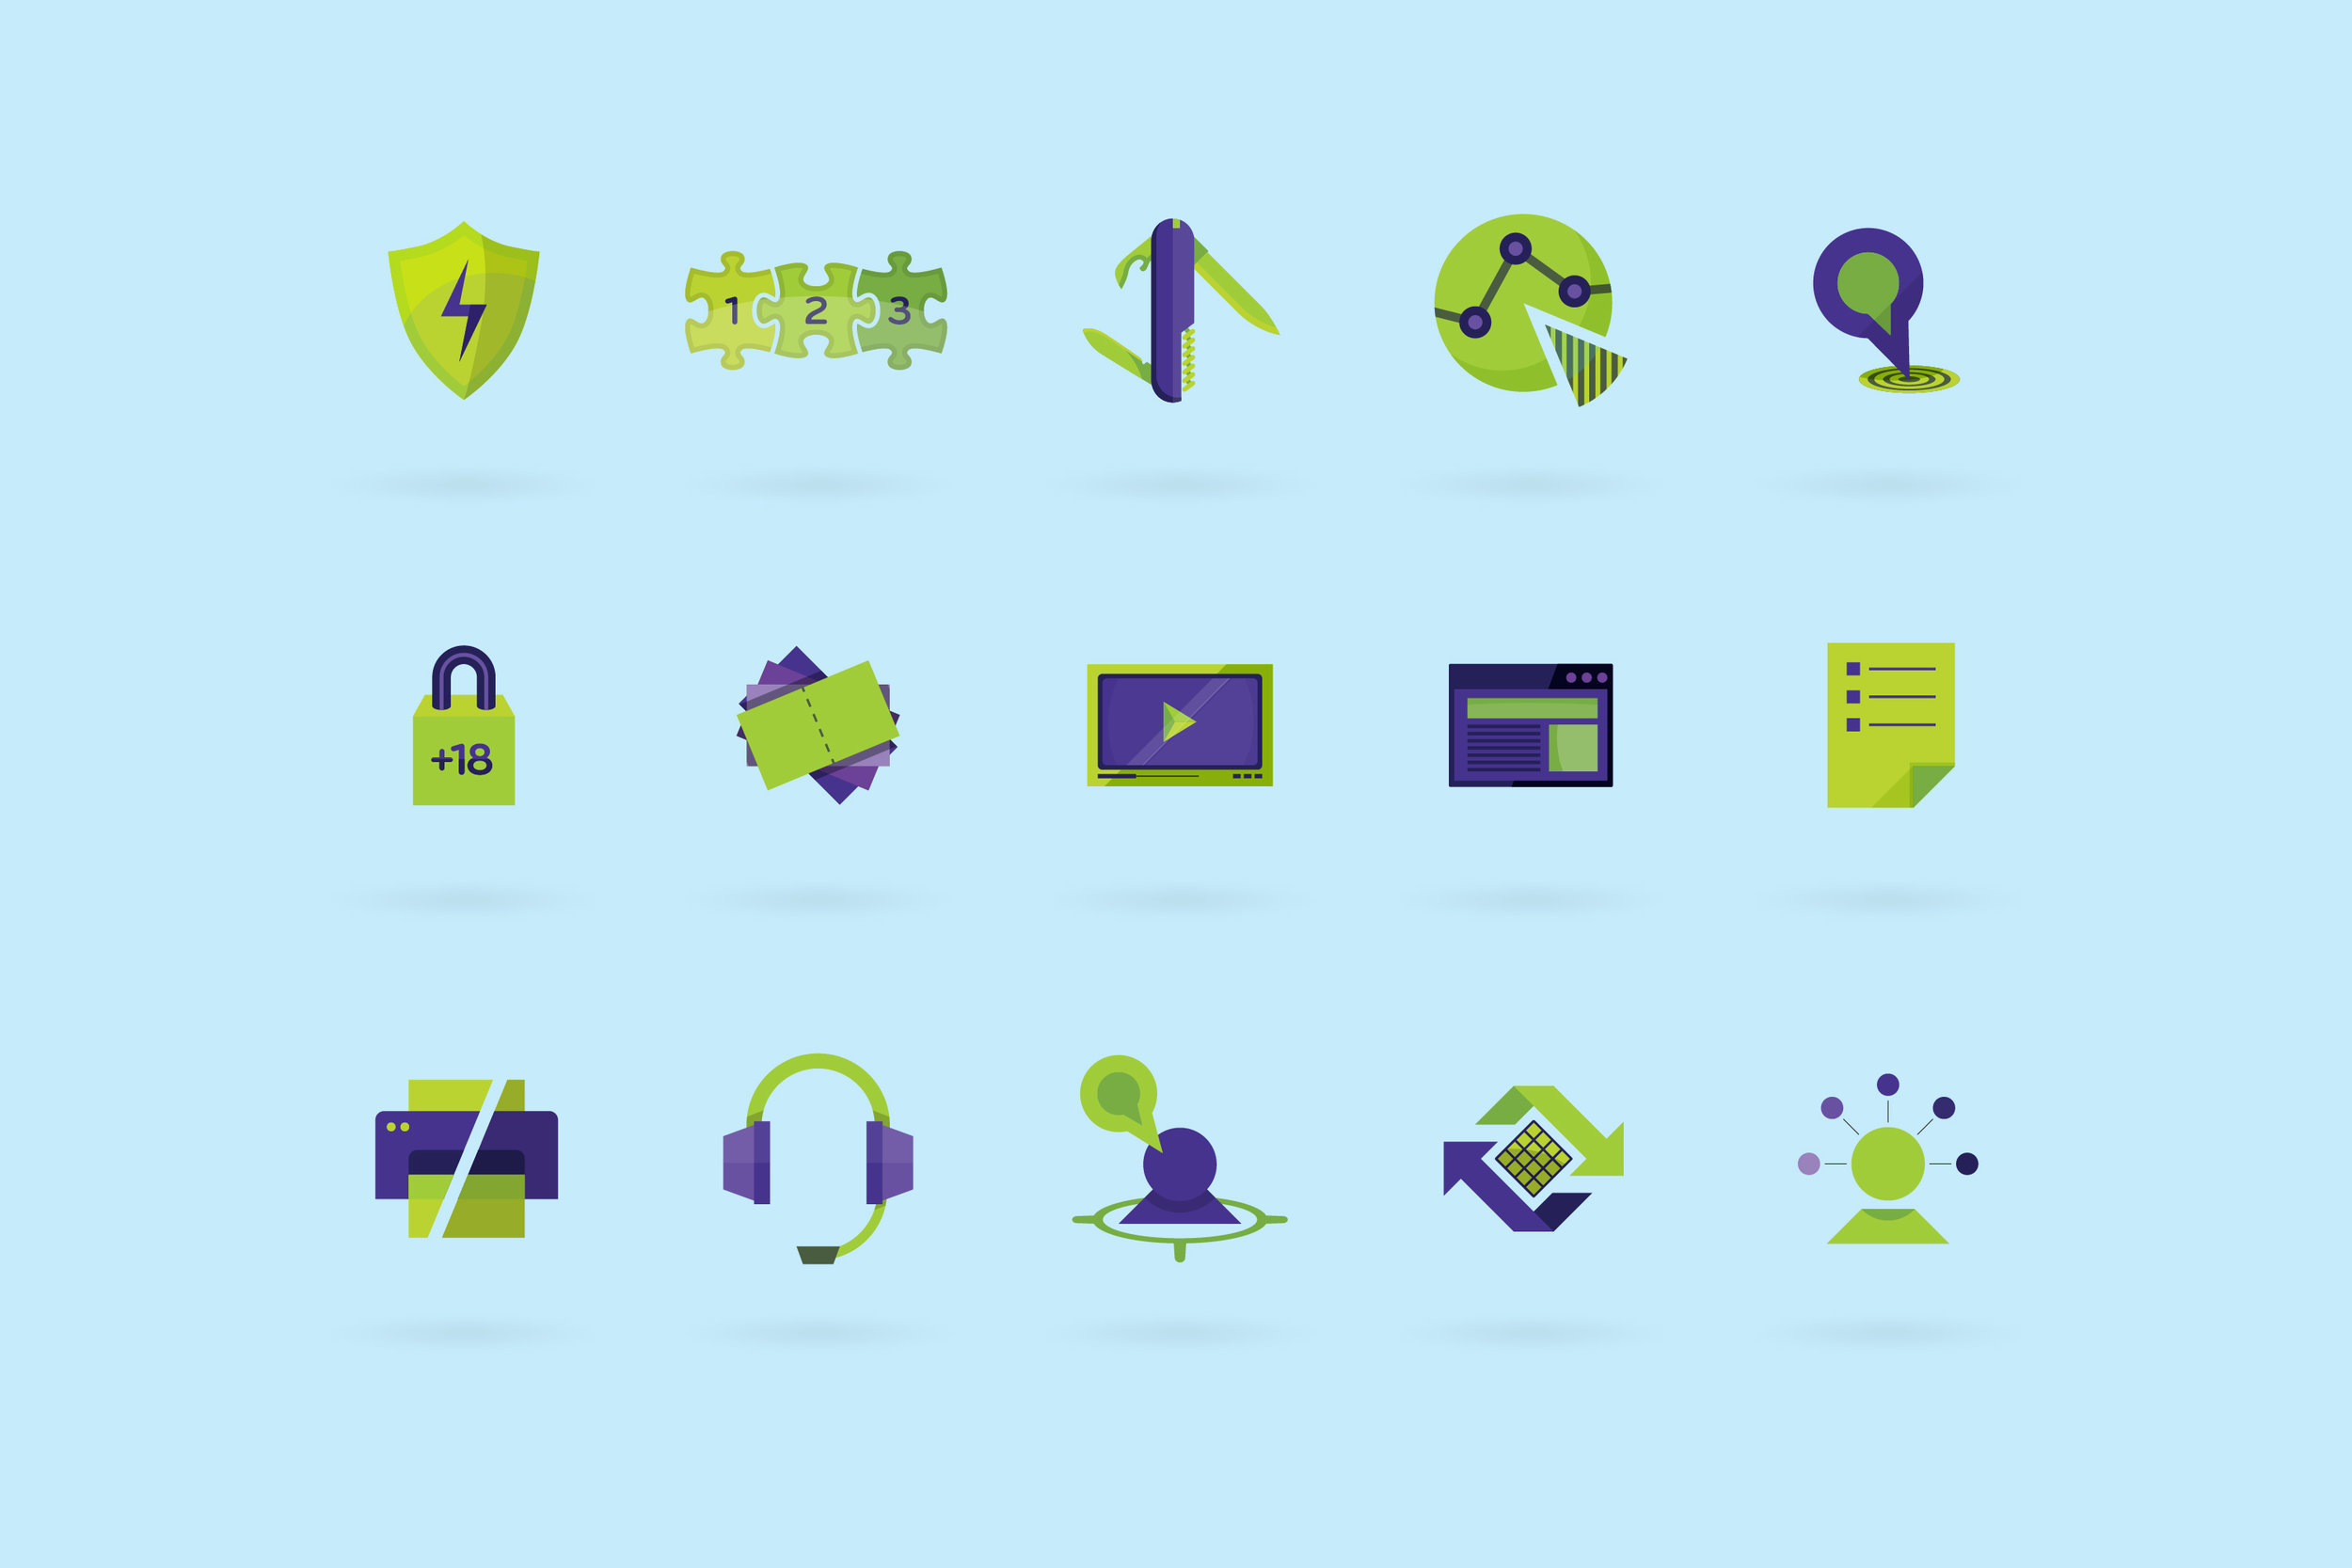 ronaldvillegas-qples-icons.jpg